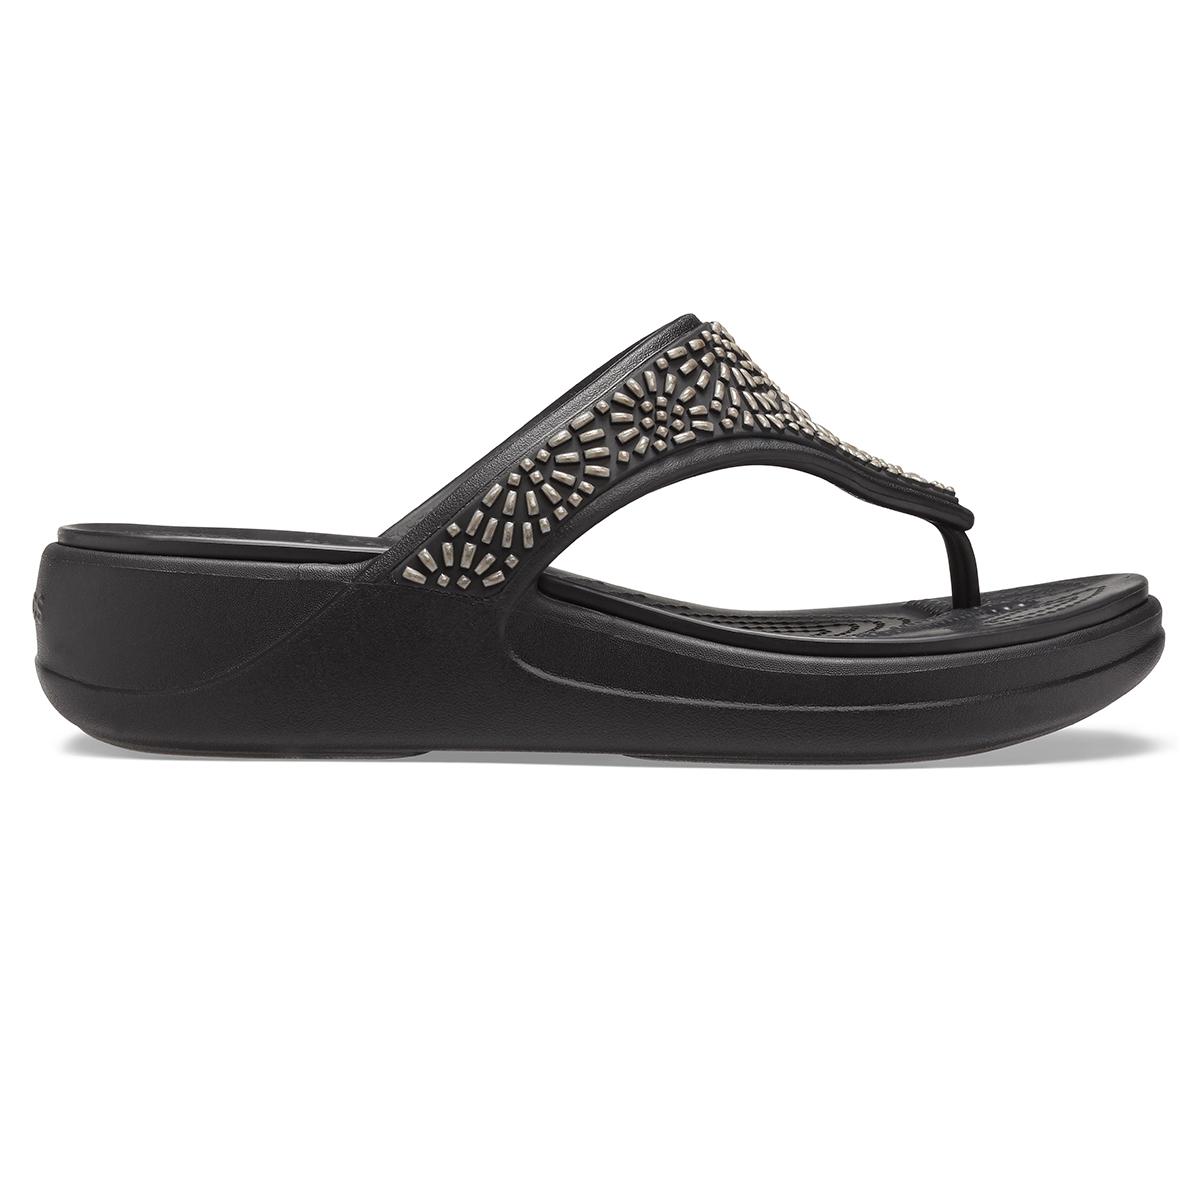 Crocs Monterey Diamante WdgFpW - Siyah